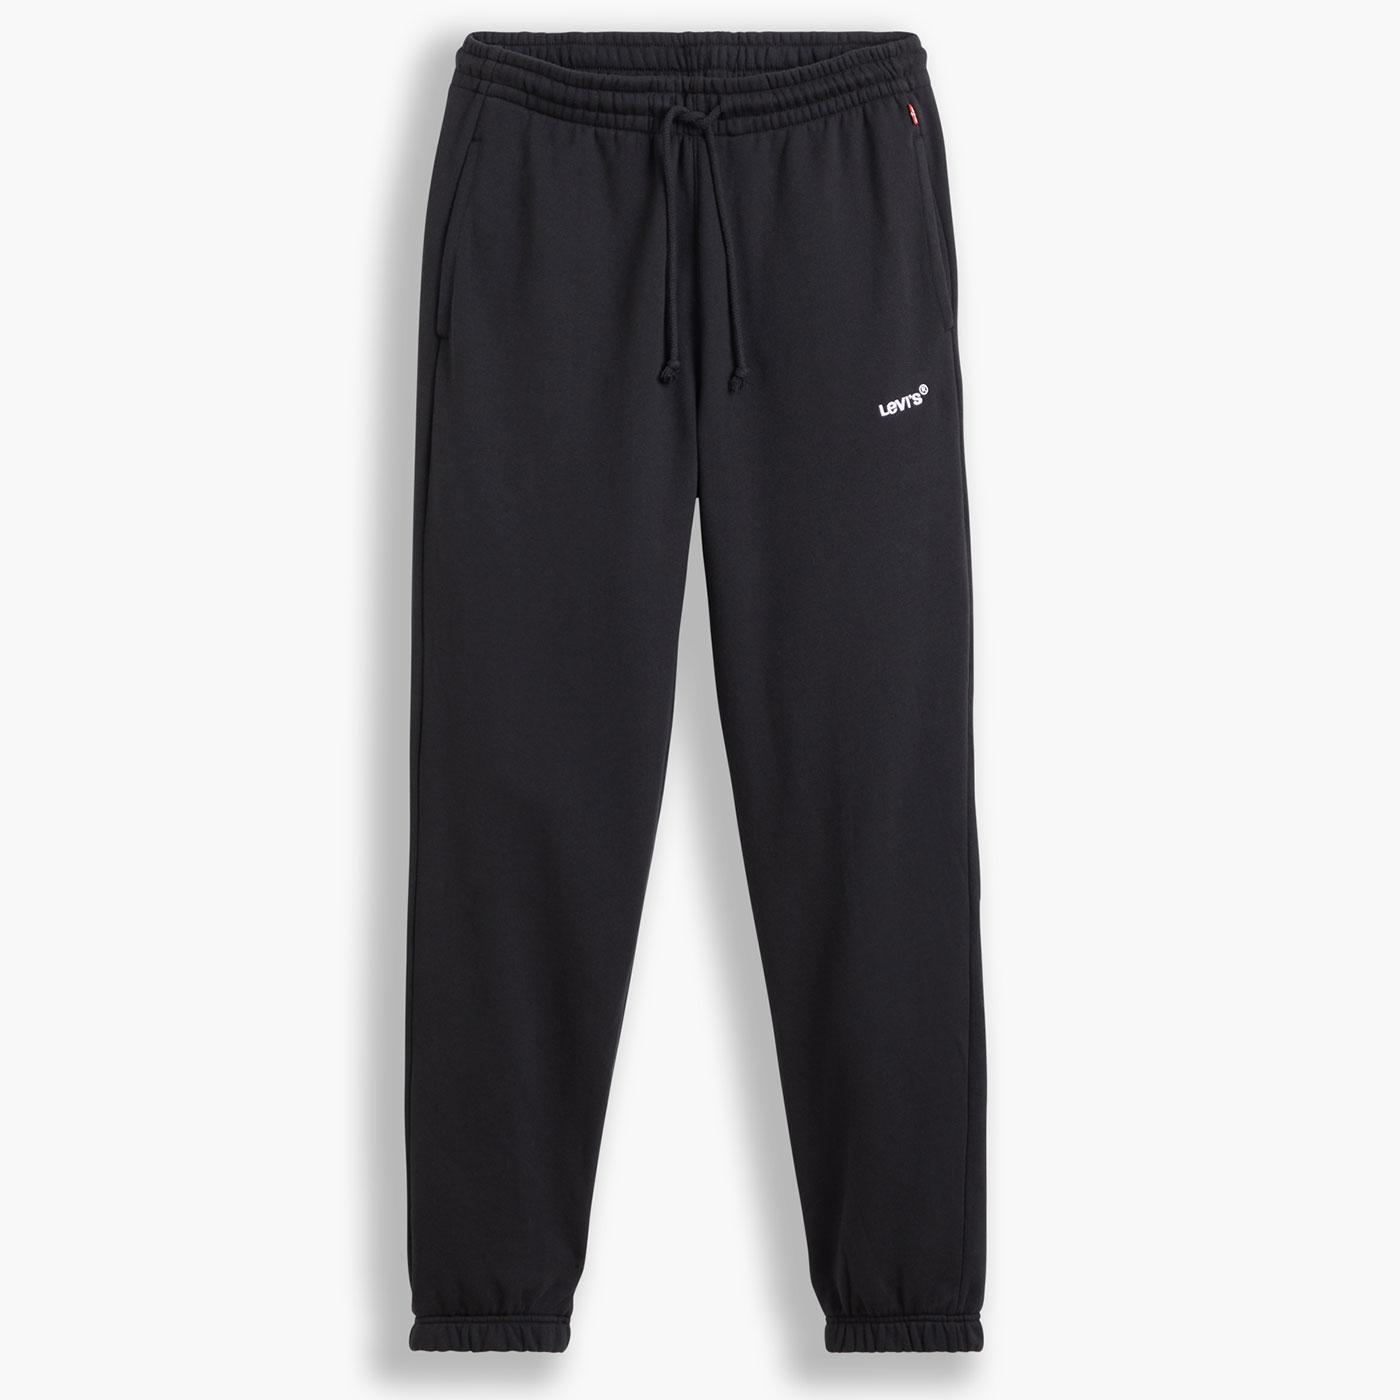 LEVI'S Red Tab Vintage Fit Sweatpants (Black)